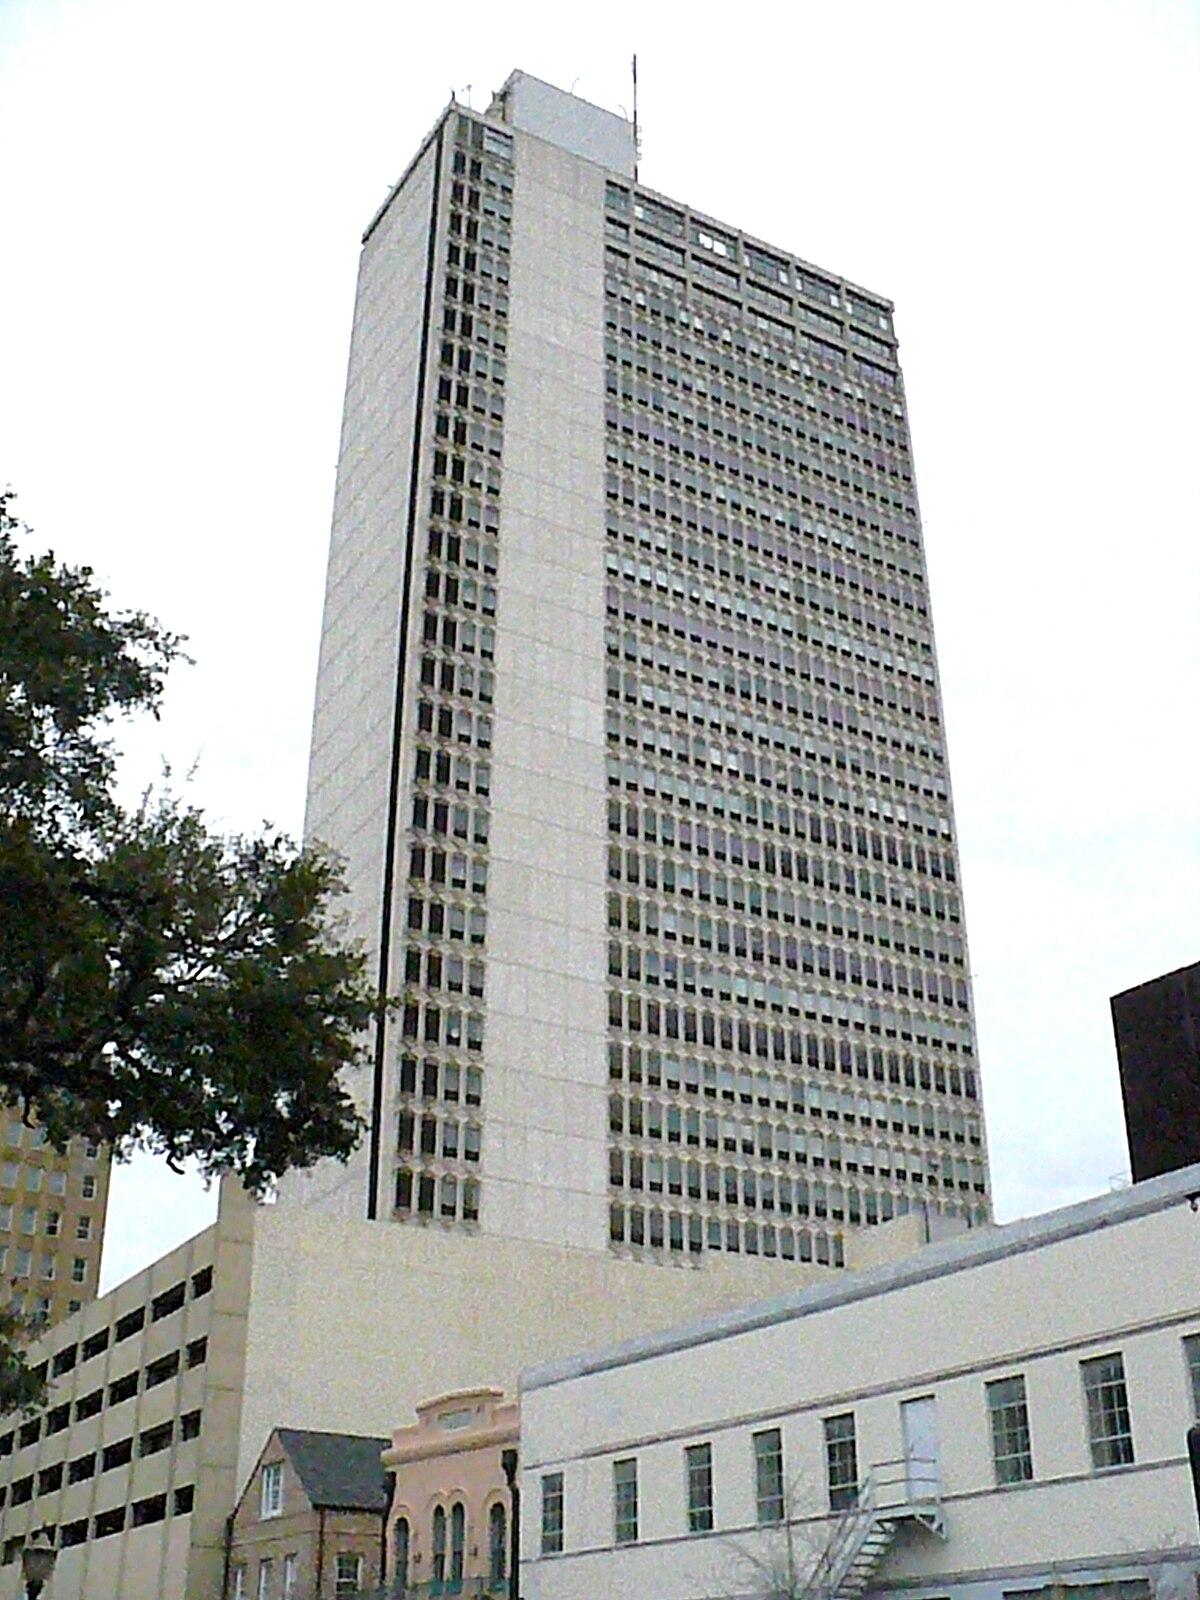 Rsa Banktrust Building Wikipedia